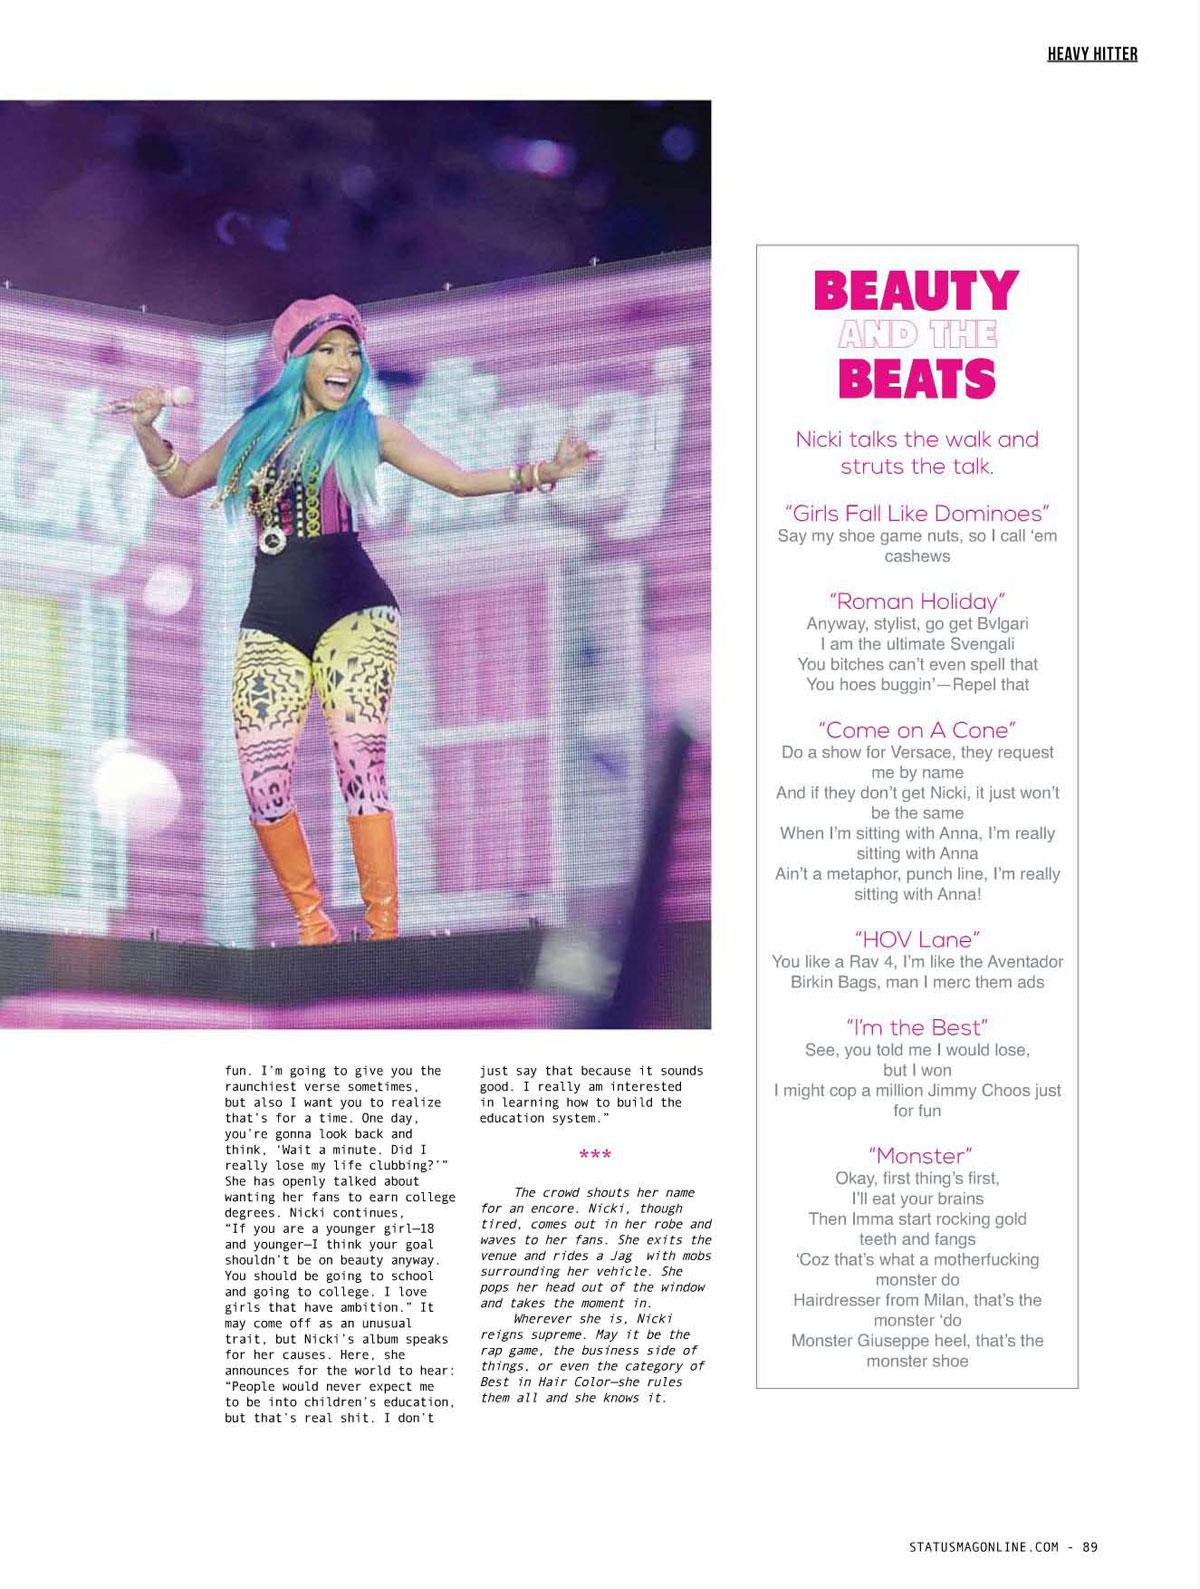 http://3.bp.blogspot.com/-plNHJIvAka4/UEznY7DnFmI/AAAAAAAA9is/H7E228DK_Kk/s1600/Nicki-Minaj-hot-magazine.jpg